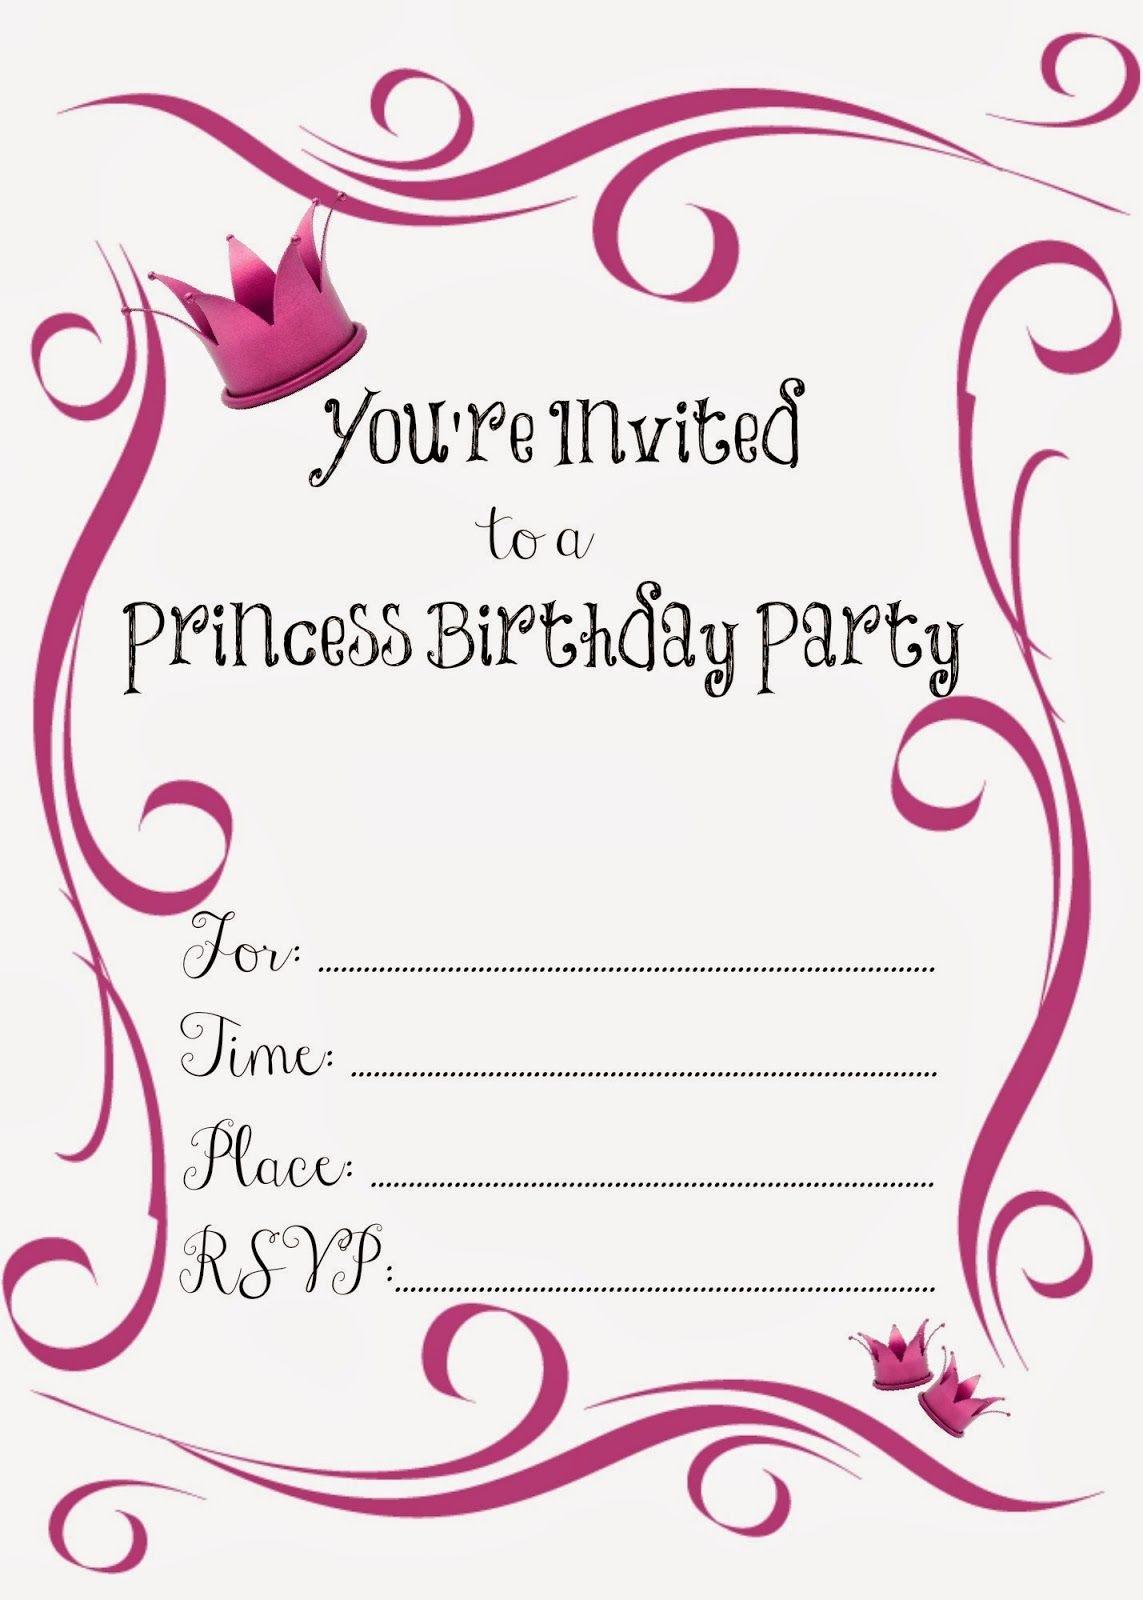 It's A Princess Thing: Free Printable Princess Birthday Party - Free Printable Princess Invitation Cards